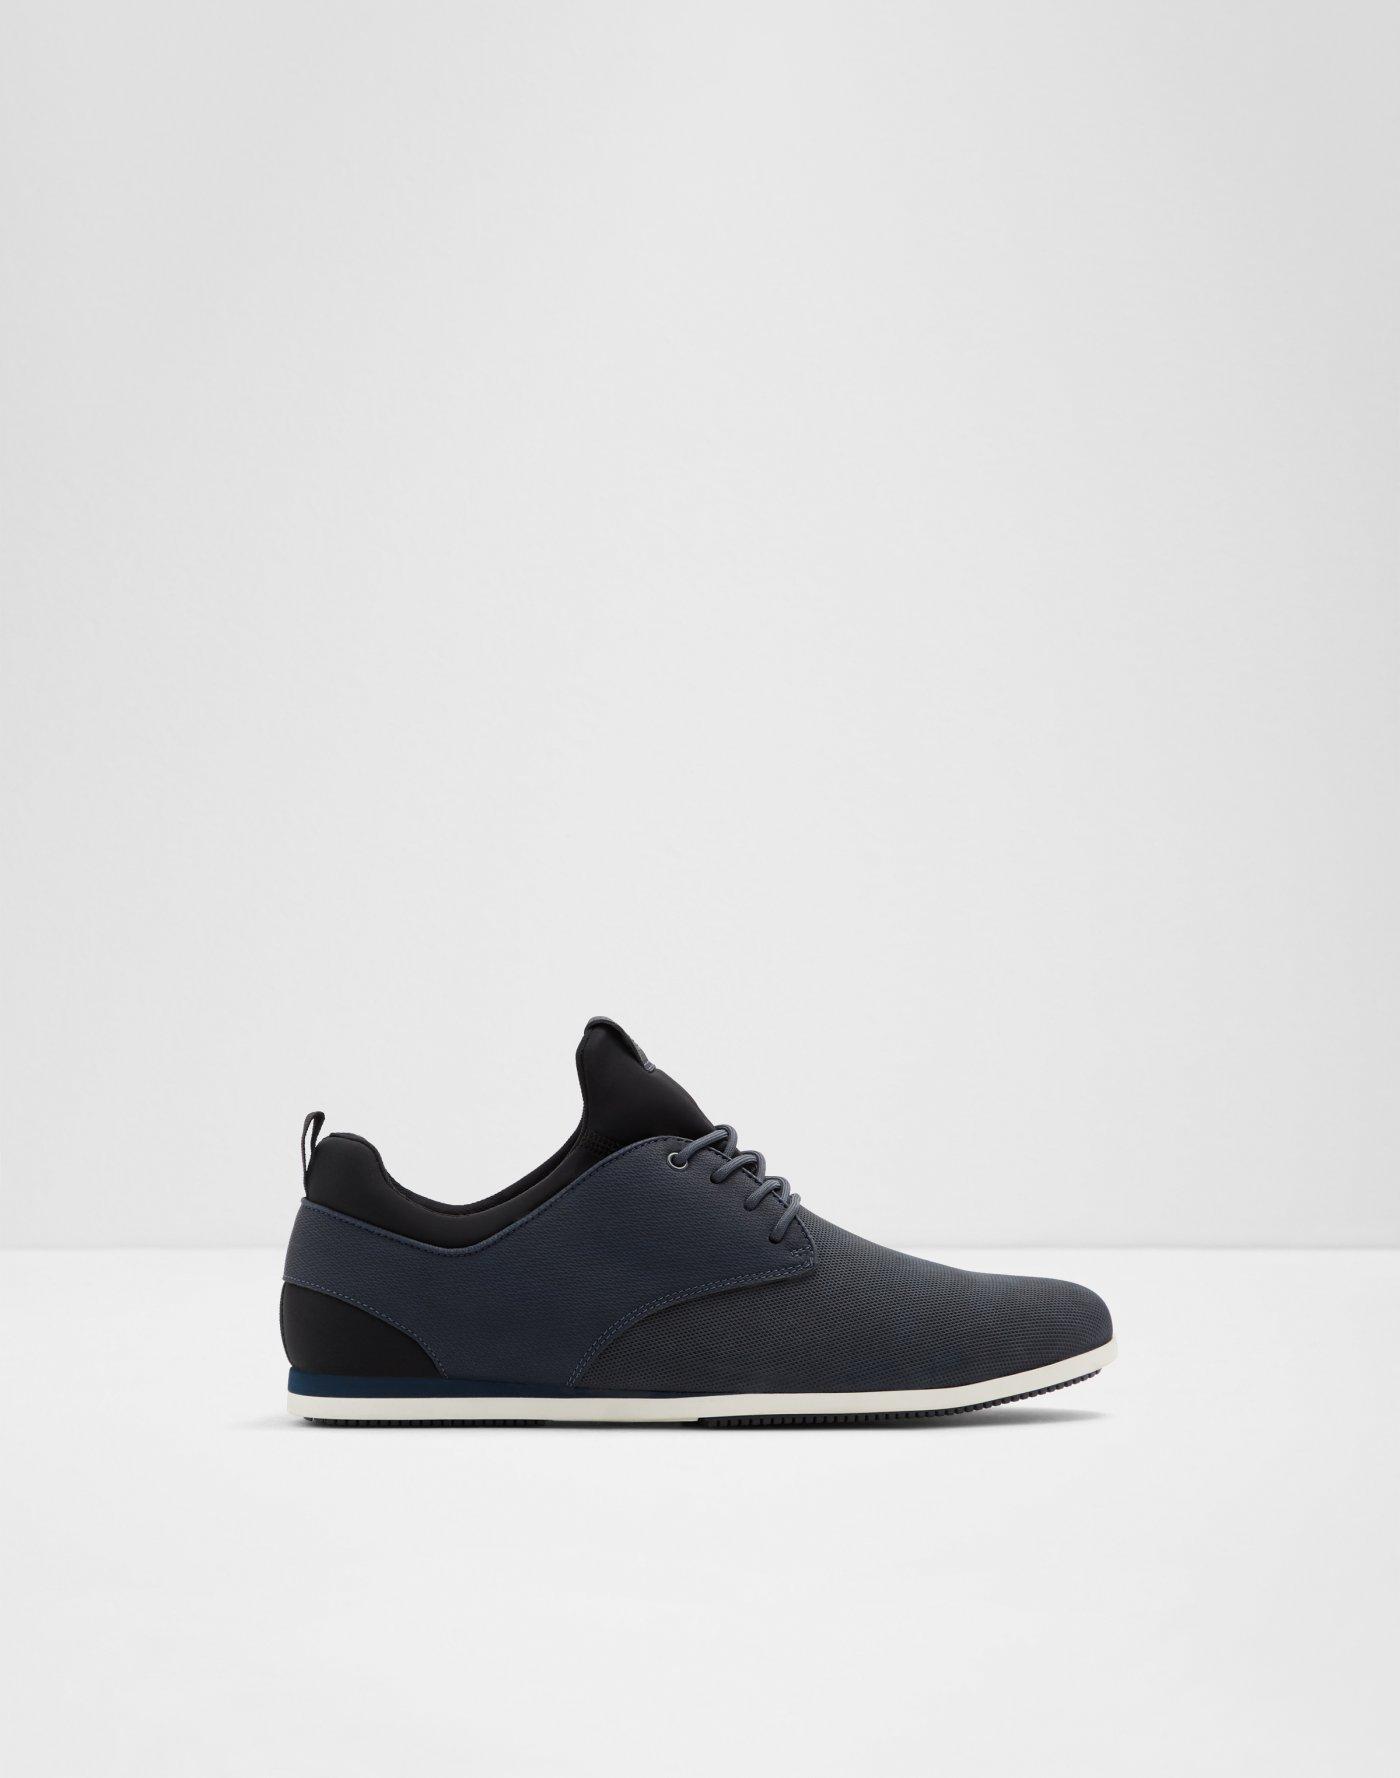 e7c546a1fbf8dd Men's Sneakers & Tennis Shoes | Fashion Sneakers | ALDO US | Aldoshoes.com  US